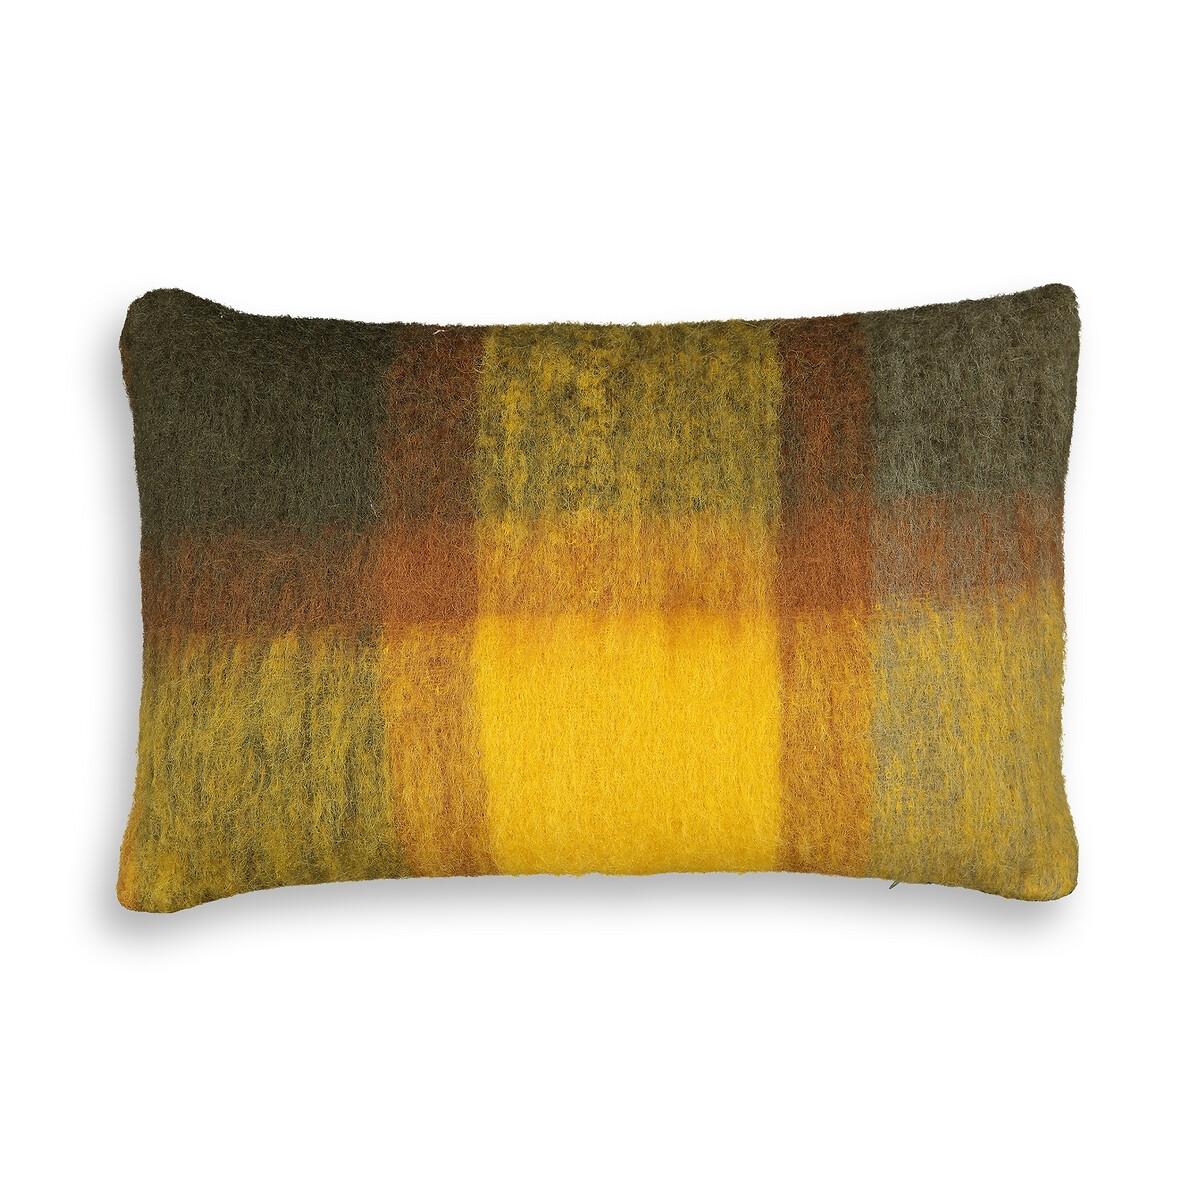 Чехол LaRedoute На подушку из шерсти Asama 60 x 40 см зеленый